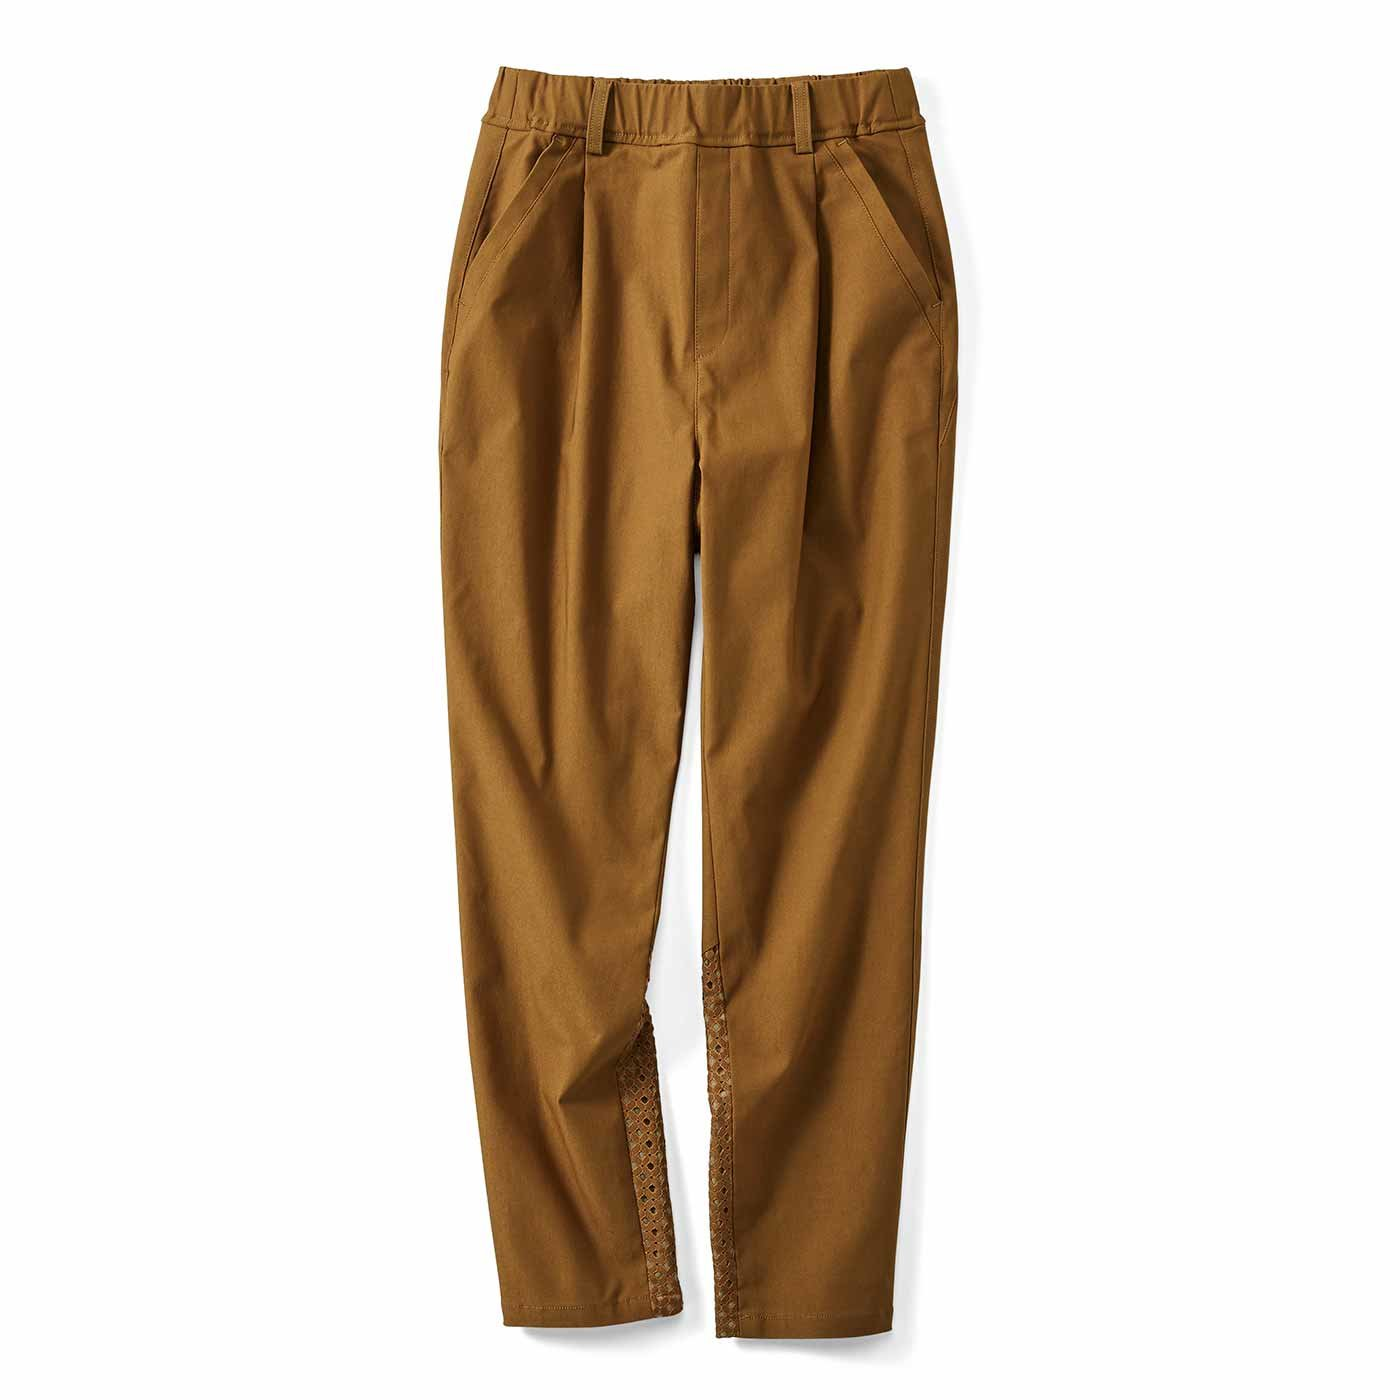 IEDIT[イディット] 歩くたびに空気が通る涼やかパンツ 美脚テーパード〈キャメル〉